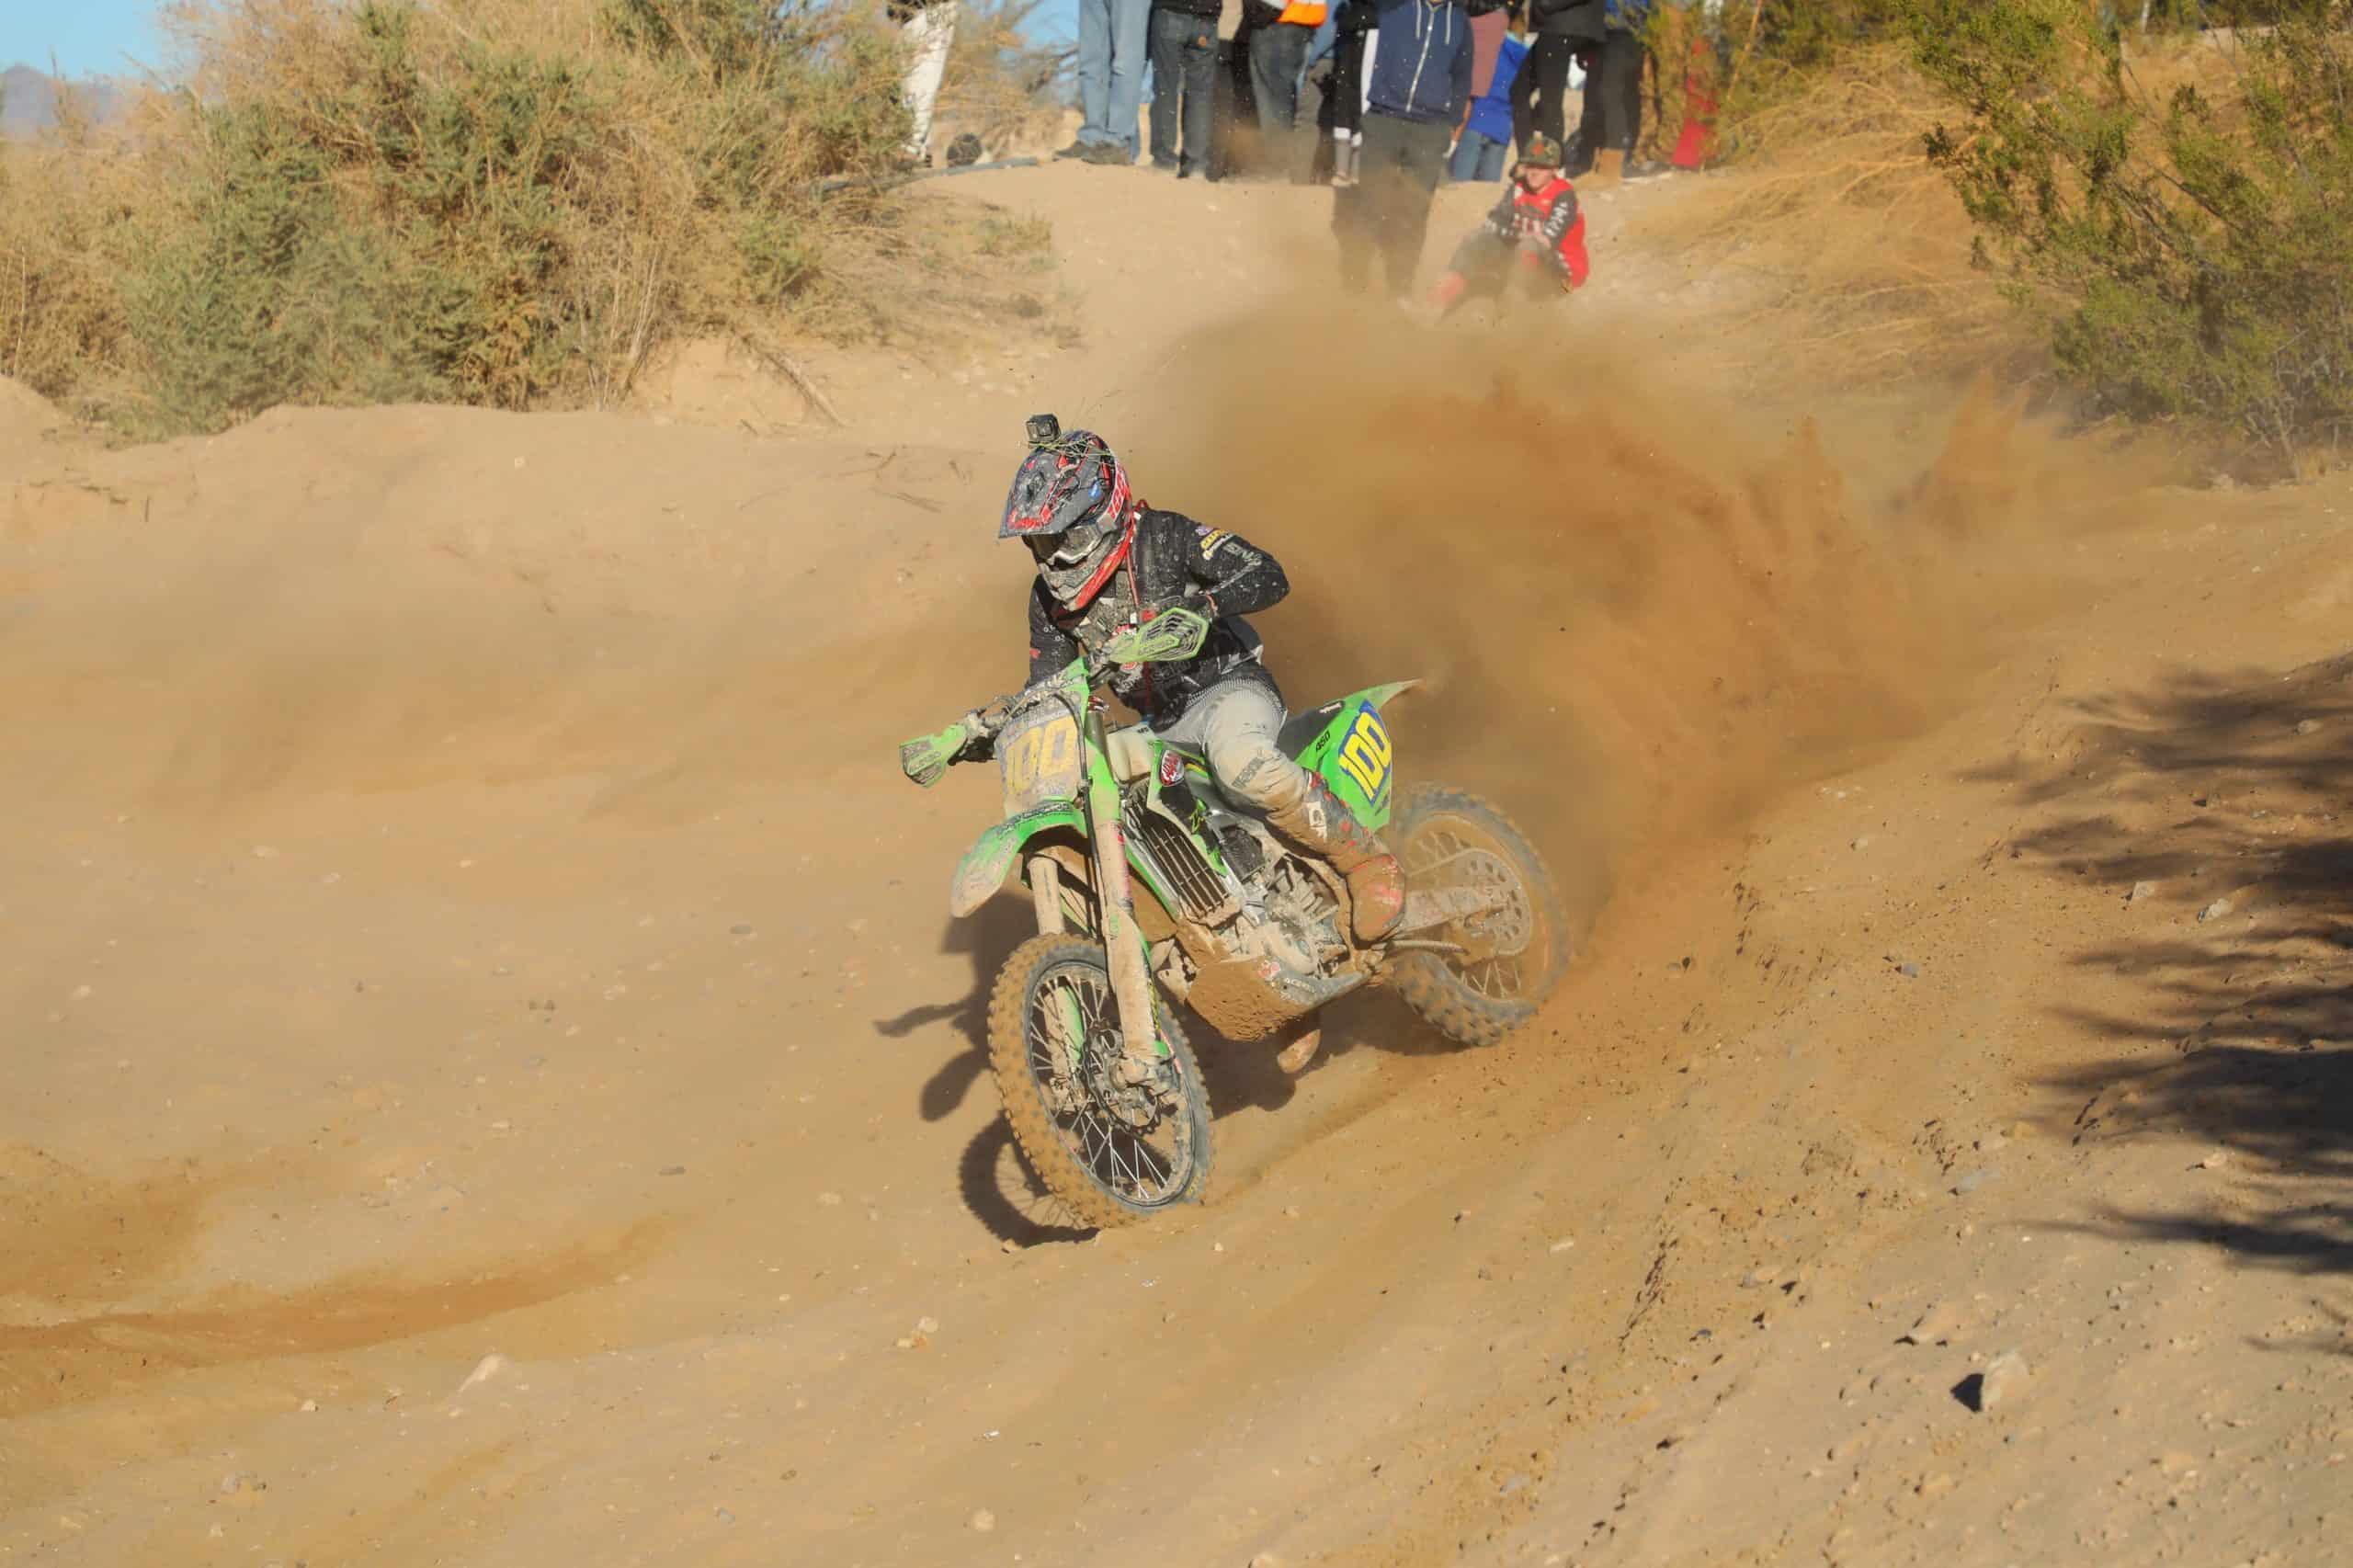 zach bell riding his kx450 at the 2020 havasu worcs